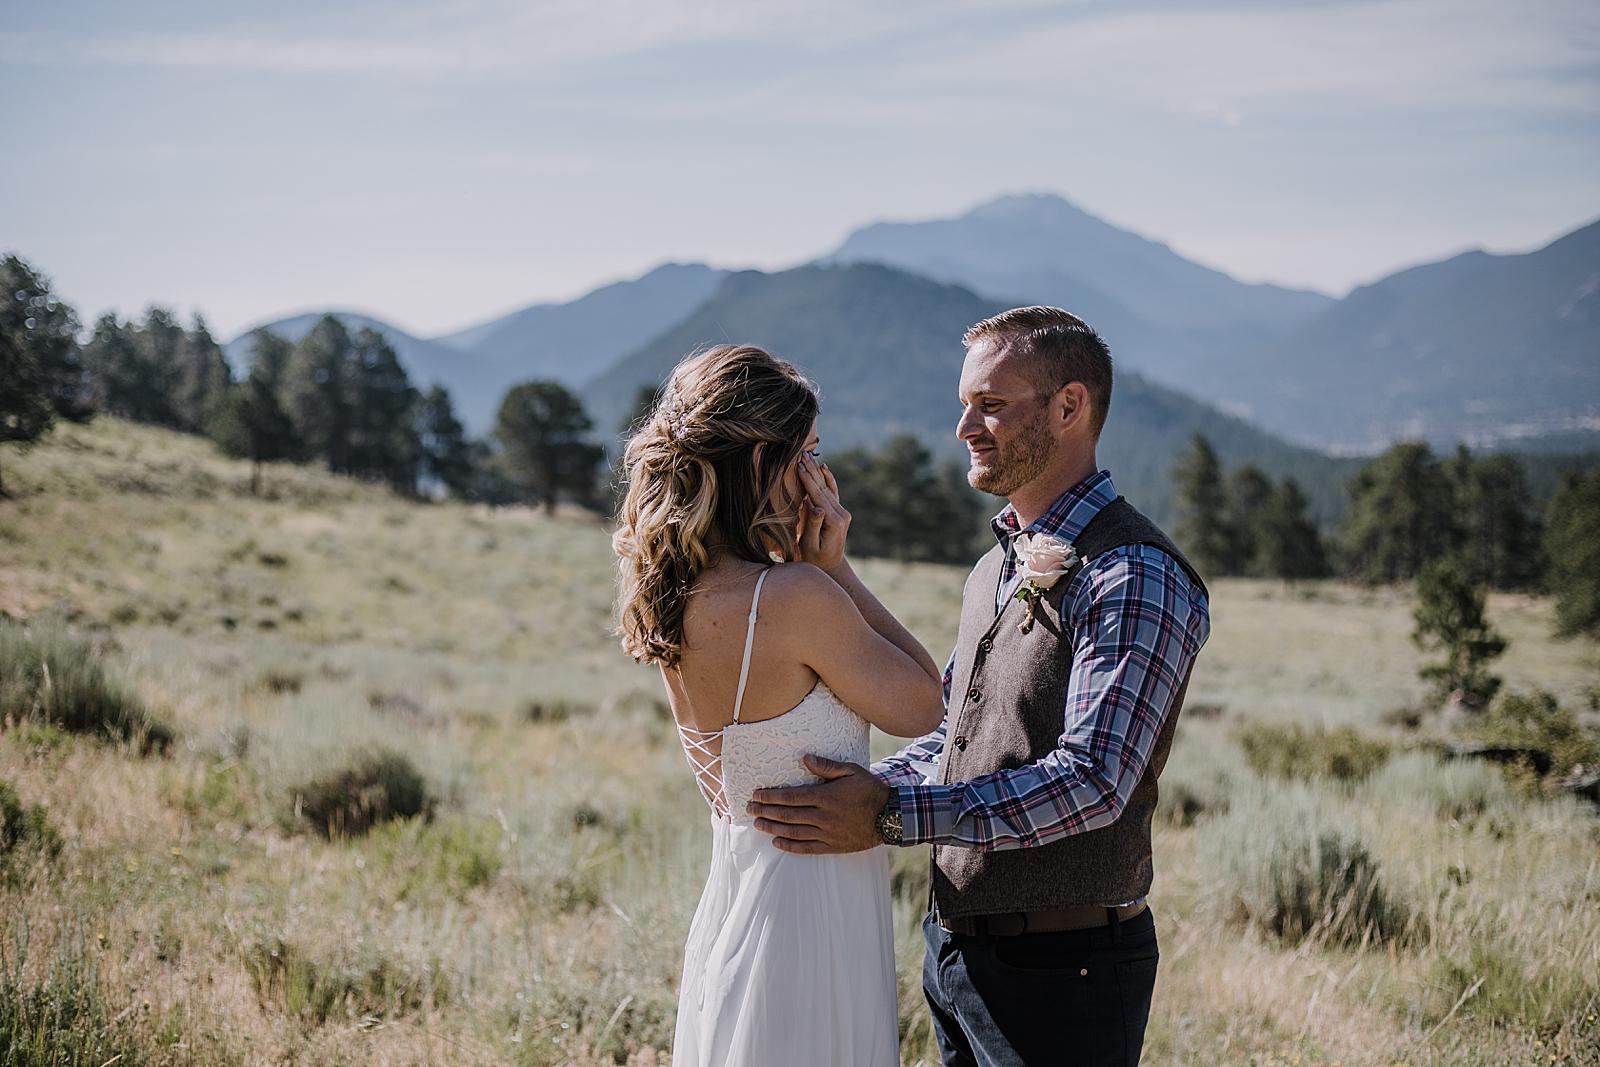 bride tearing up, rocky mountain national park elopement, 3M curves elopement, self solemnizing, self solemnization, long's peak ceremony, hiking elopement, estes park elopement